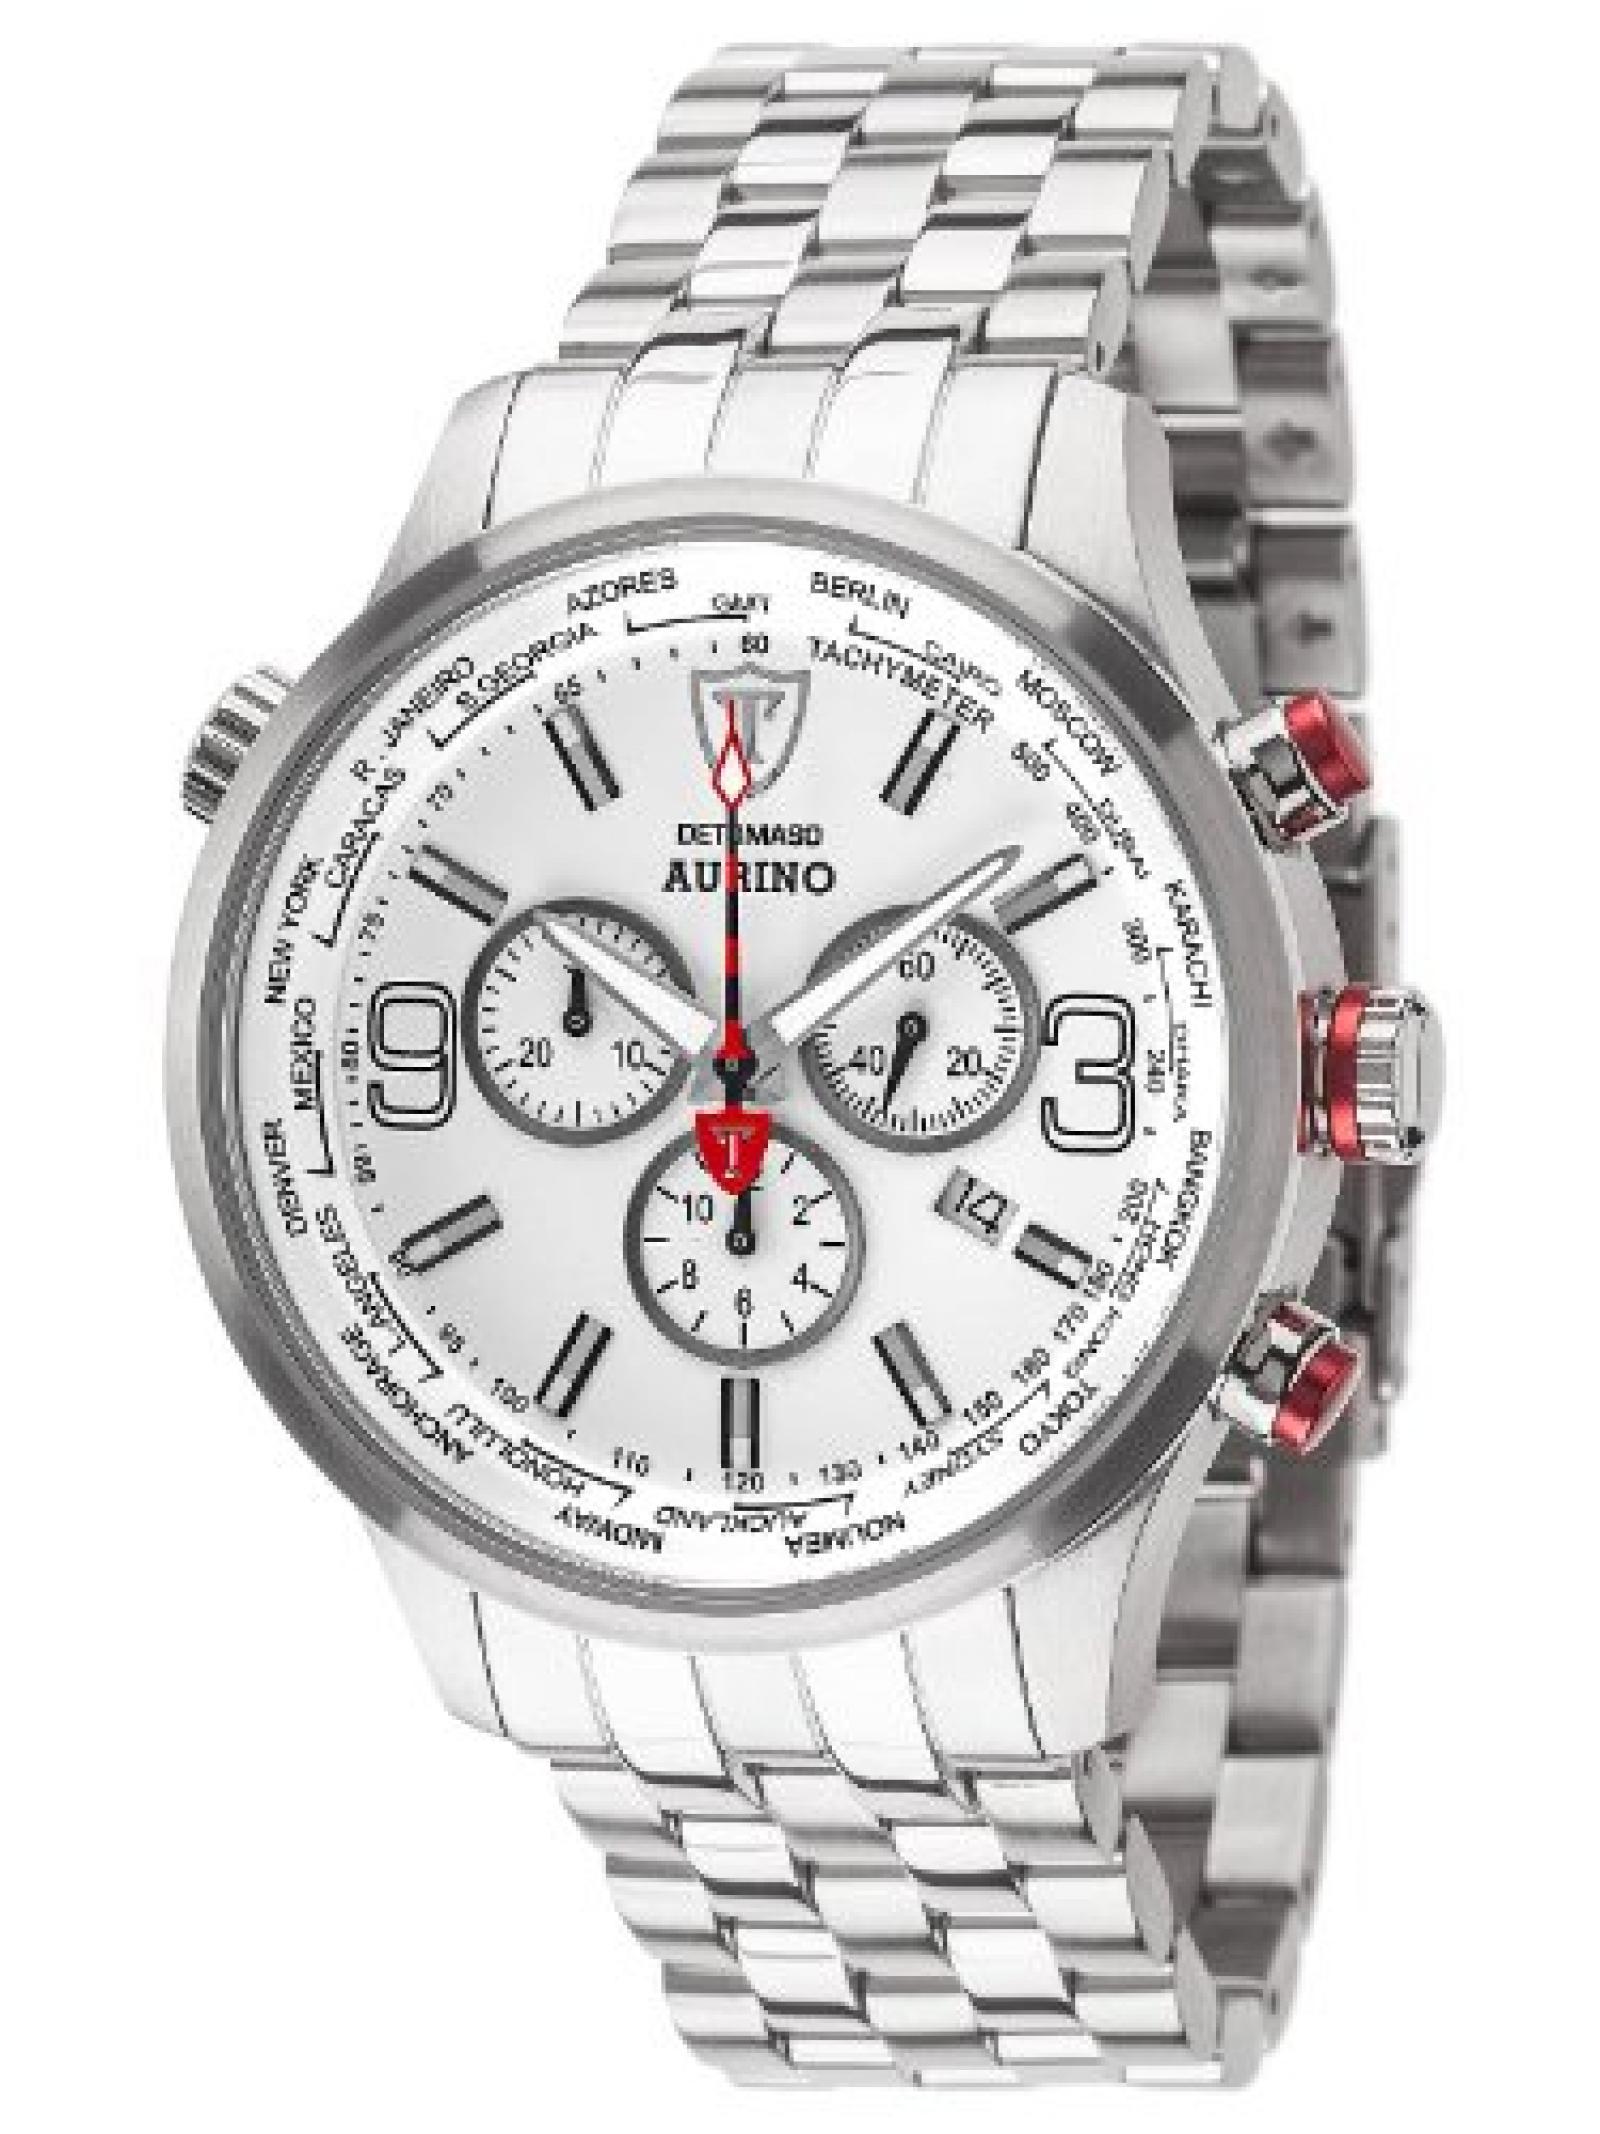 Detomaso Herren-Armbanduhr XL AURINO Chronograph Silver/White Chronograph Quarz Edelstahl DT1061-D